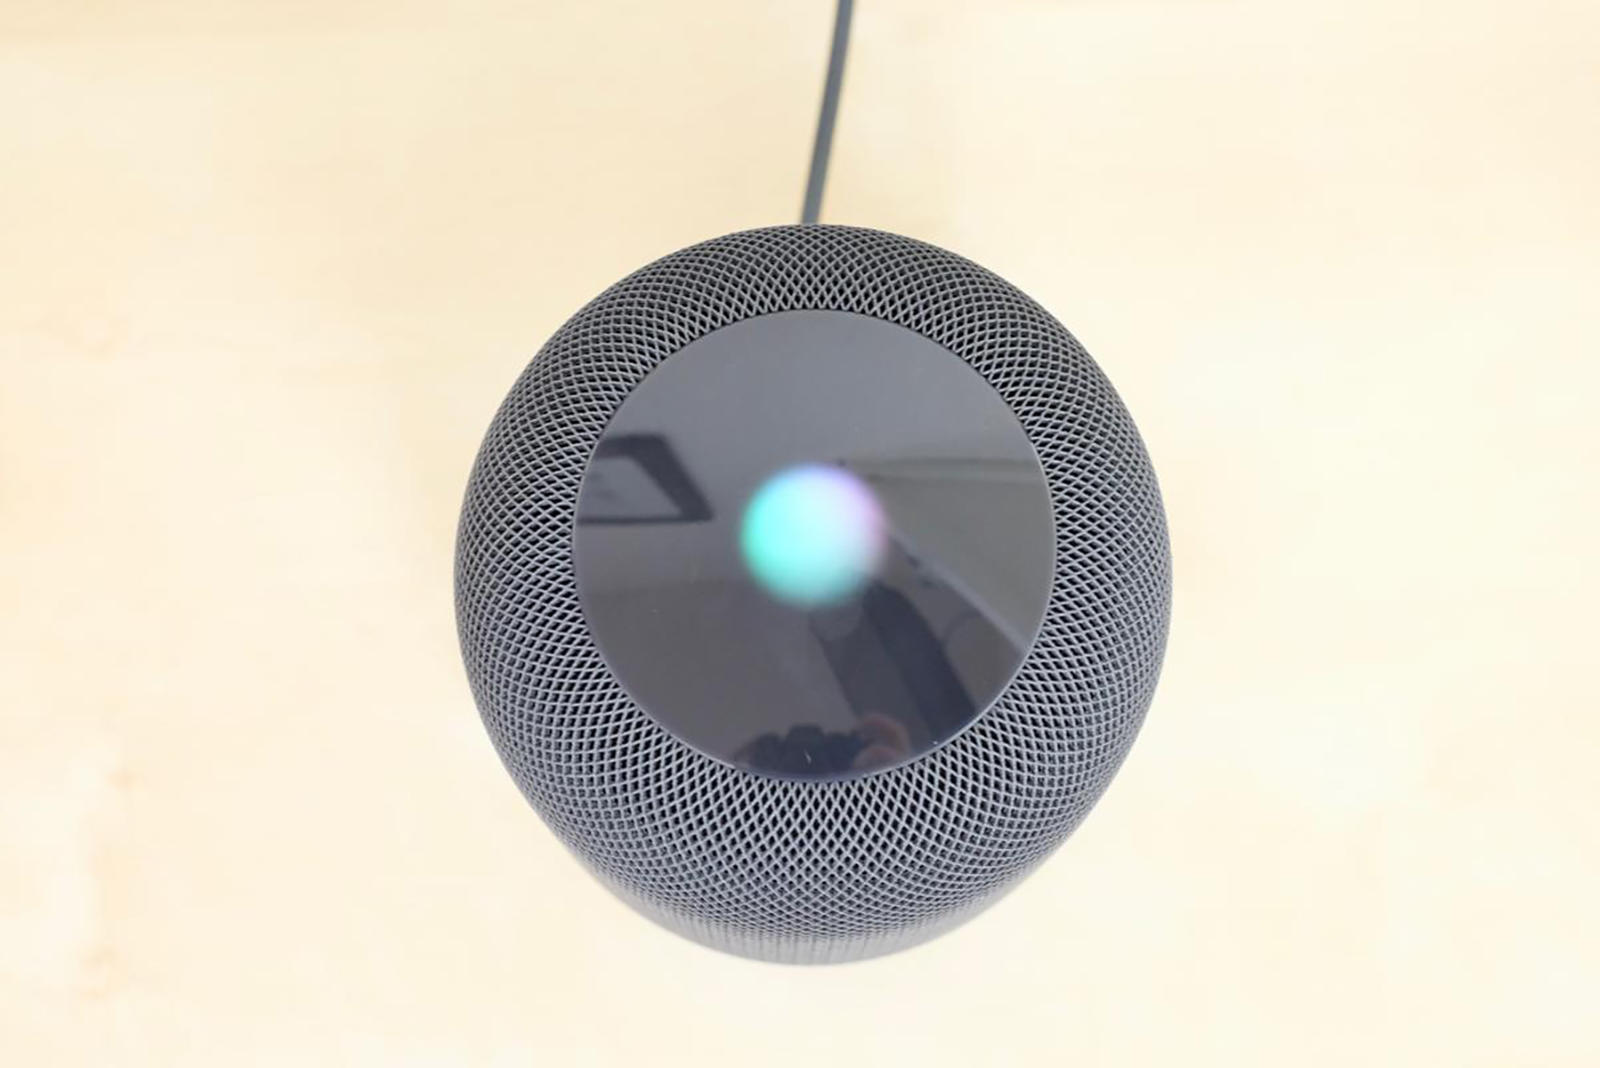 apple-homepod-3.jpg